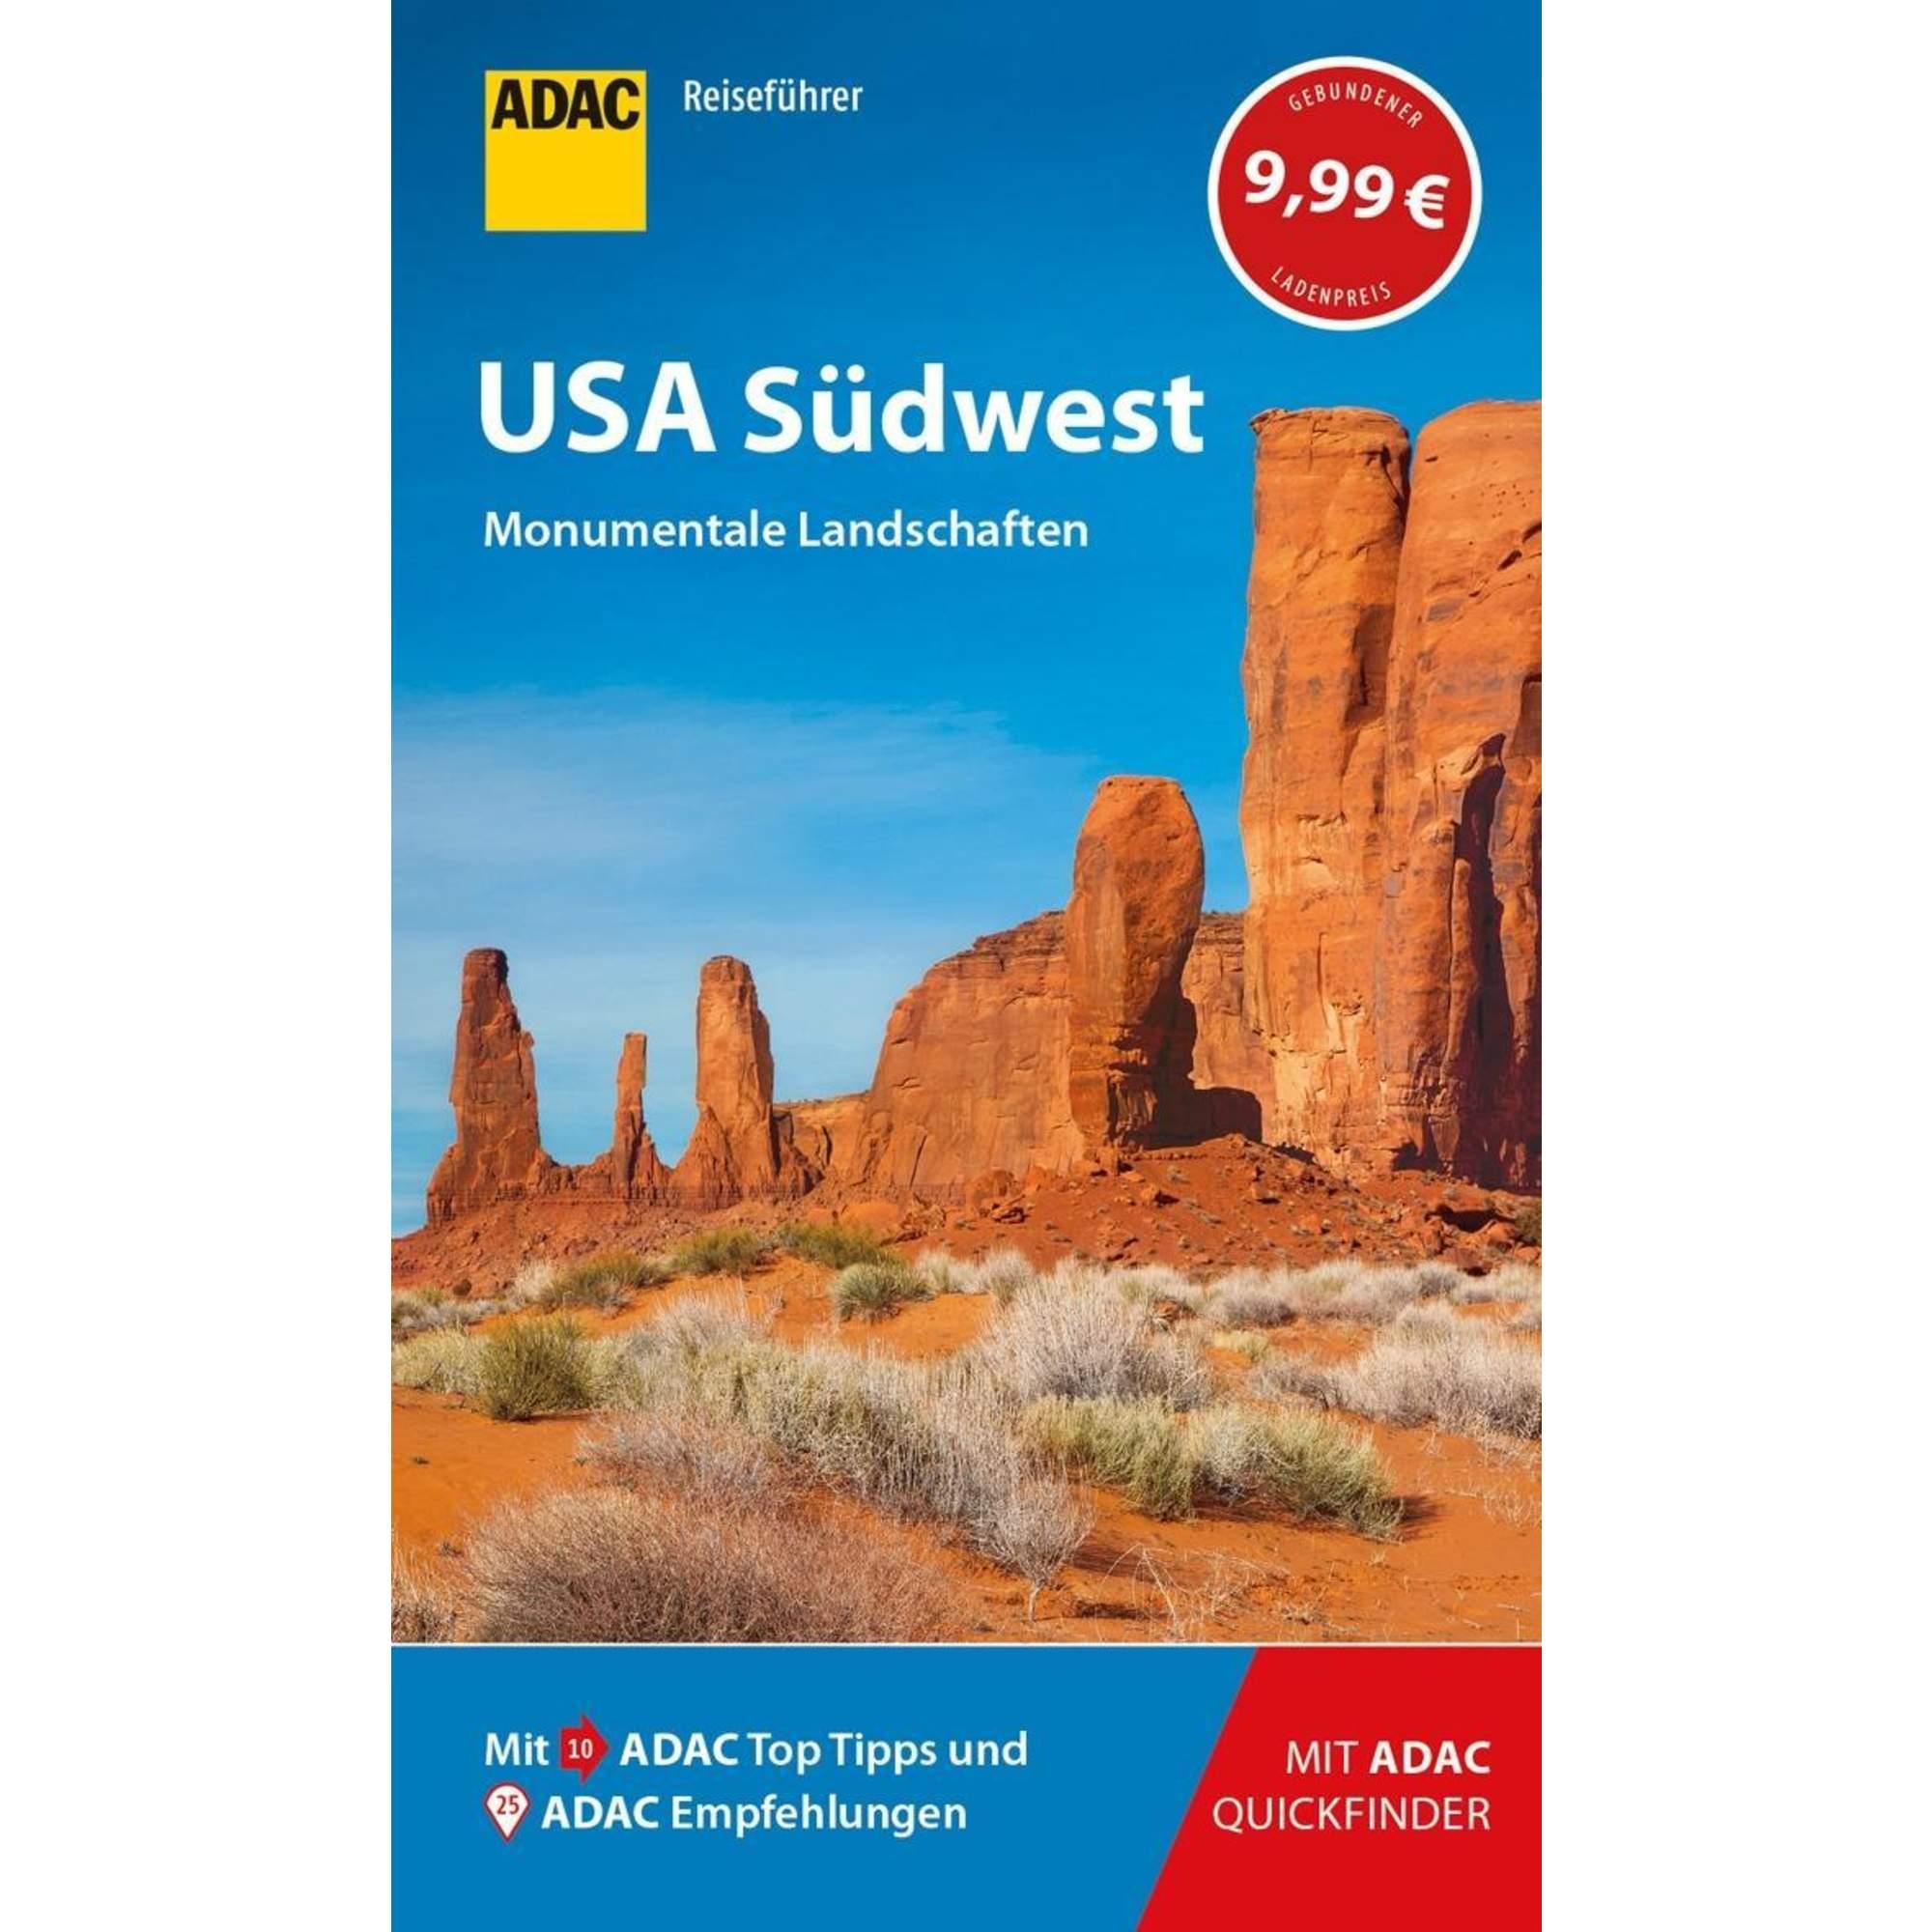 ADAC Reiseführer USA Südwest, 9,99 Euro